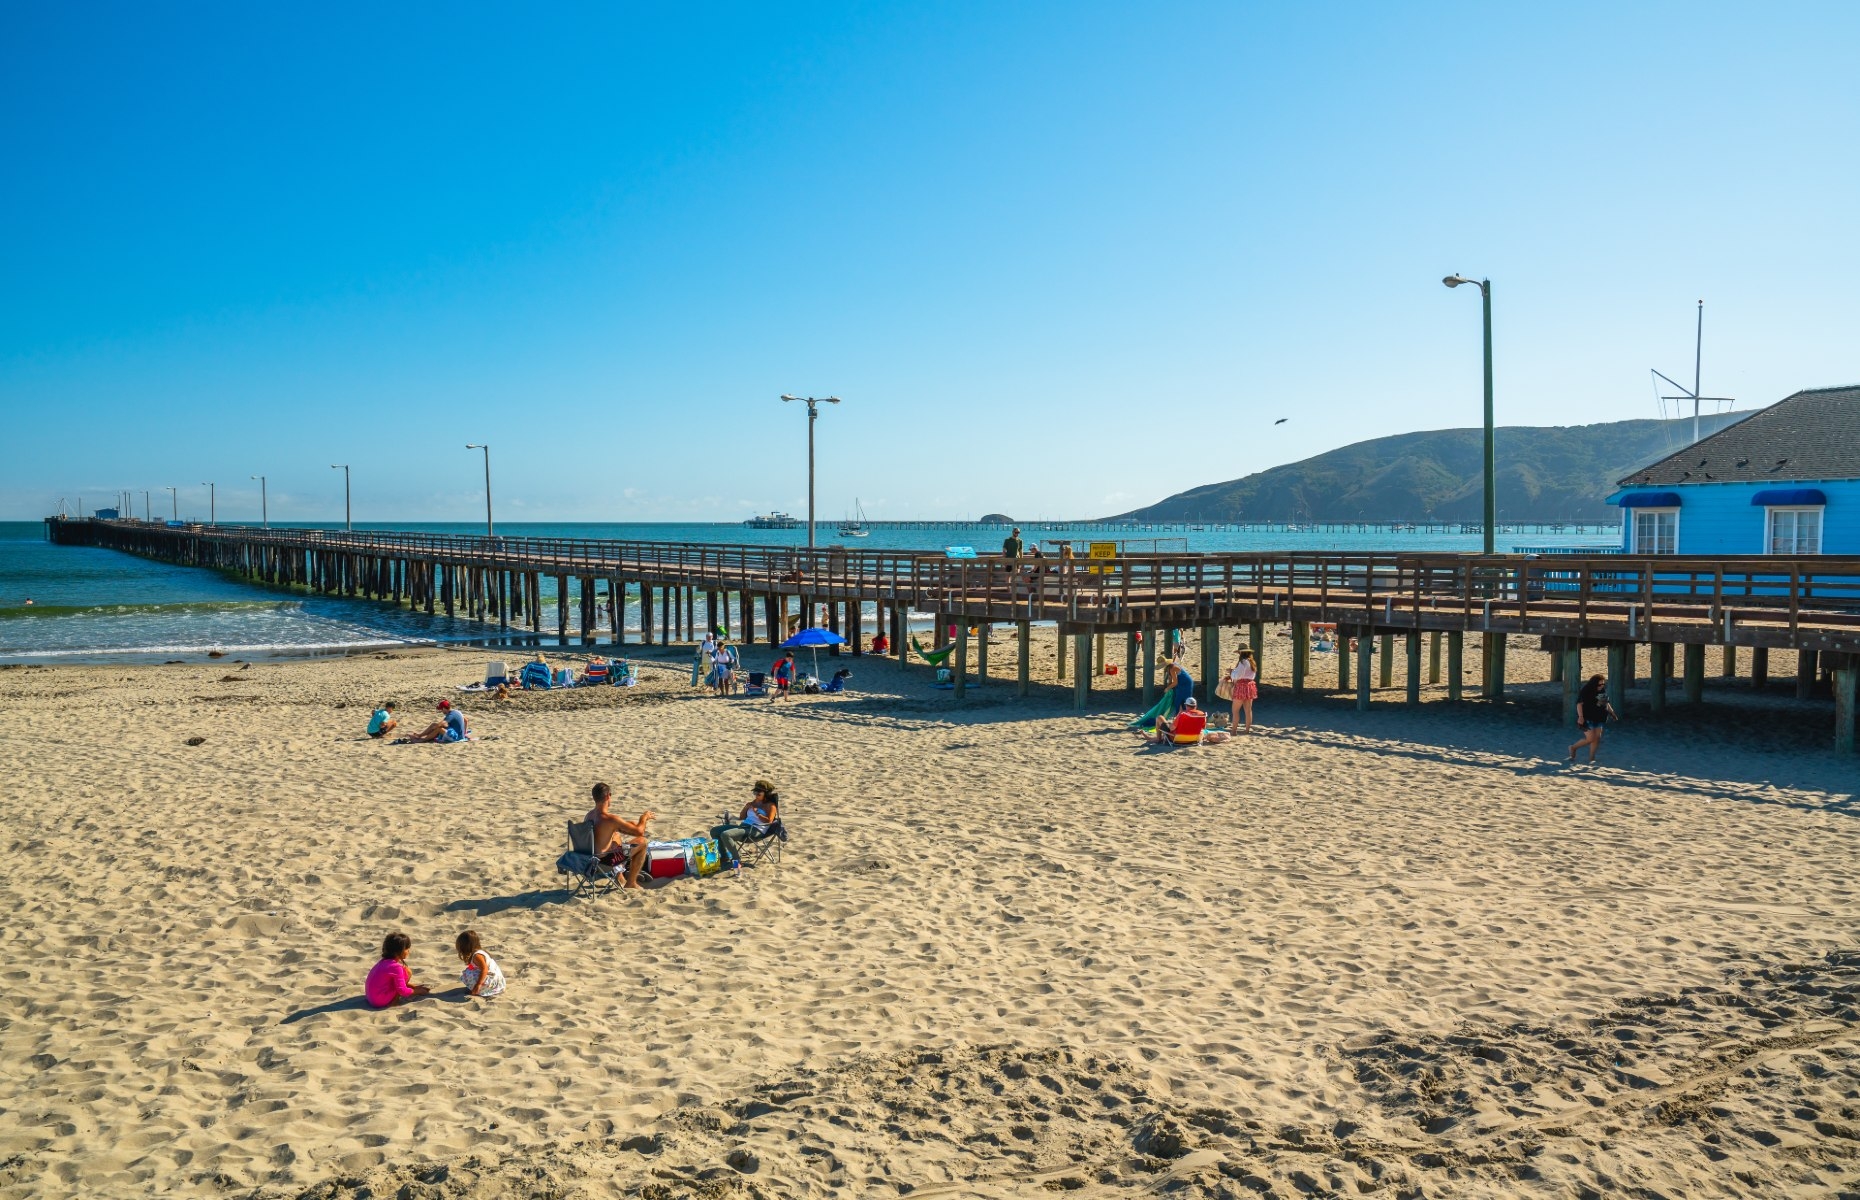 Avila Beach (Image: Hanna Tor/Shutterstock)